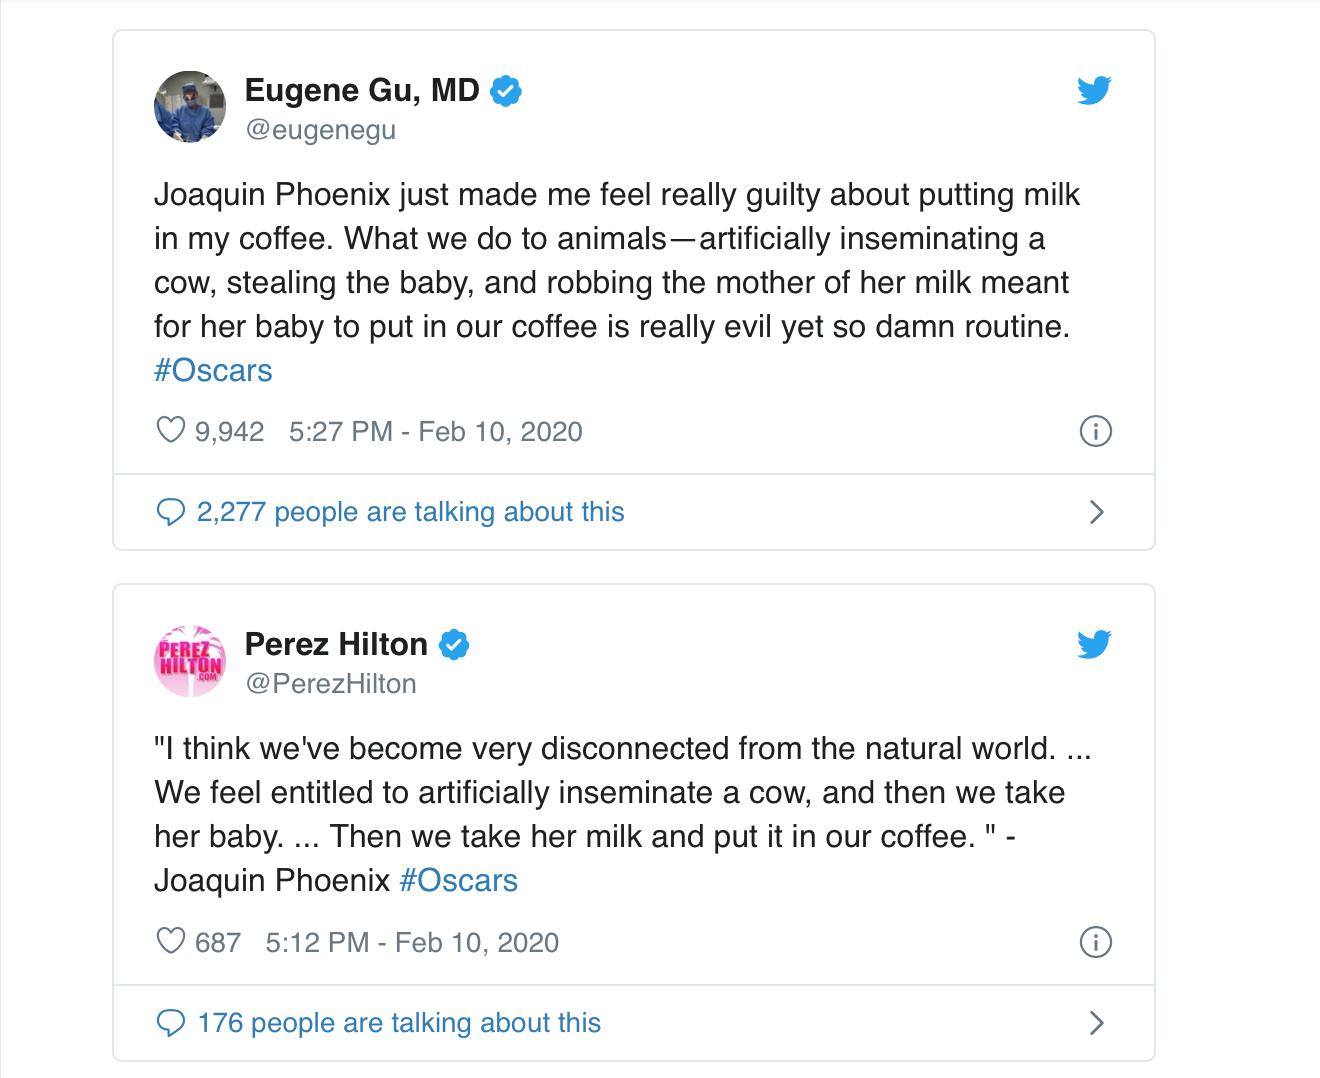 Tweets after Joaquin Phoenix's Oscars speech.